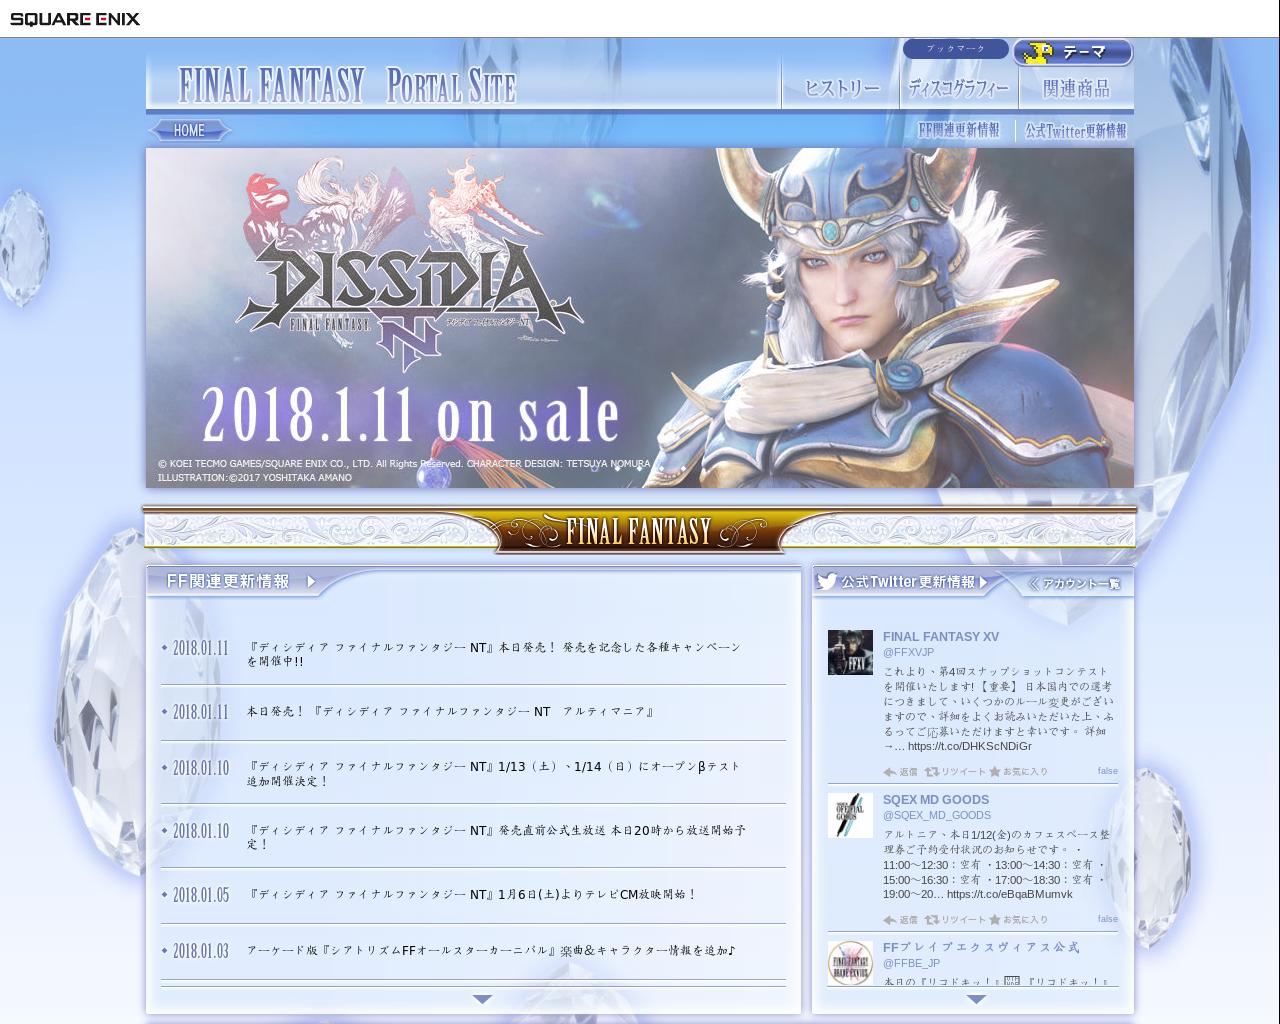 www.finalfantasy.jp(2018/01/12 11:10:41)